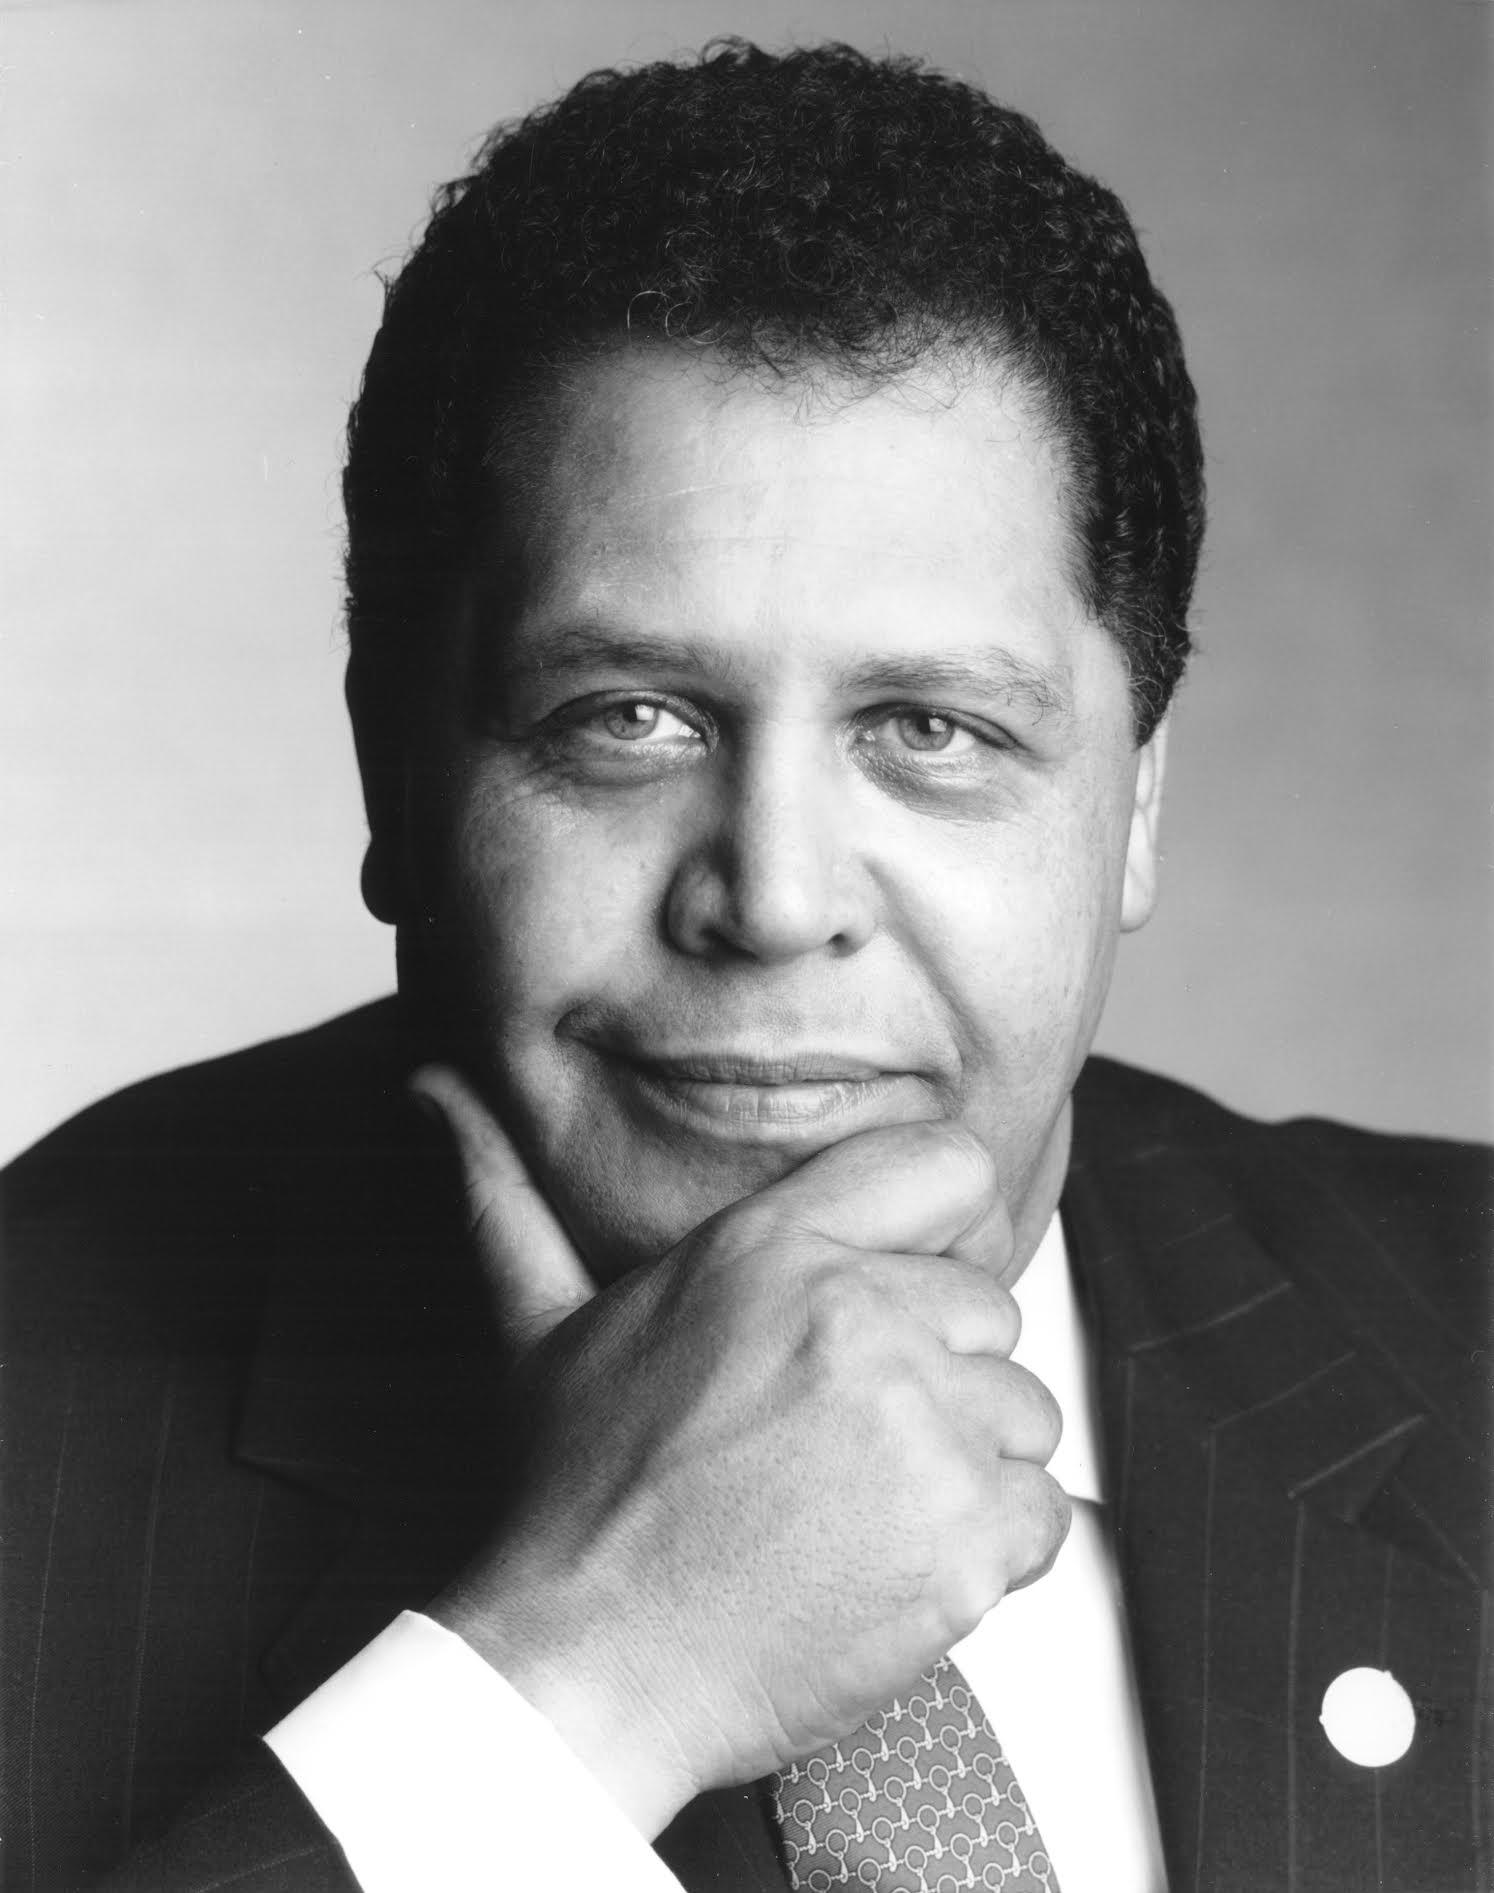 Maynard H. Jackson, first African American mayor of Atlanta, Class of 1956